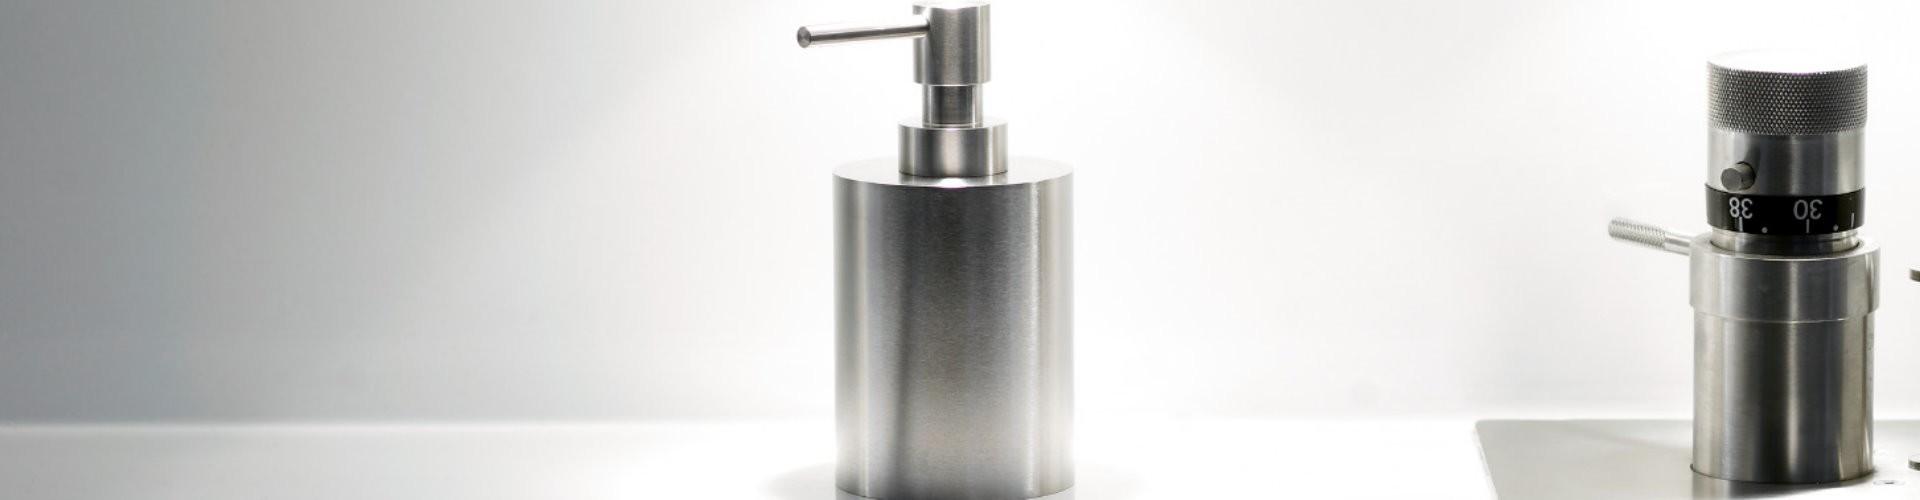 Formani Holland Piet Boon One Bathware - Homebits UK